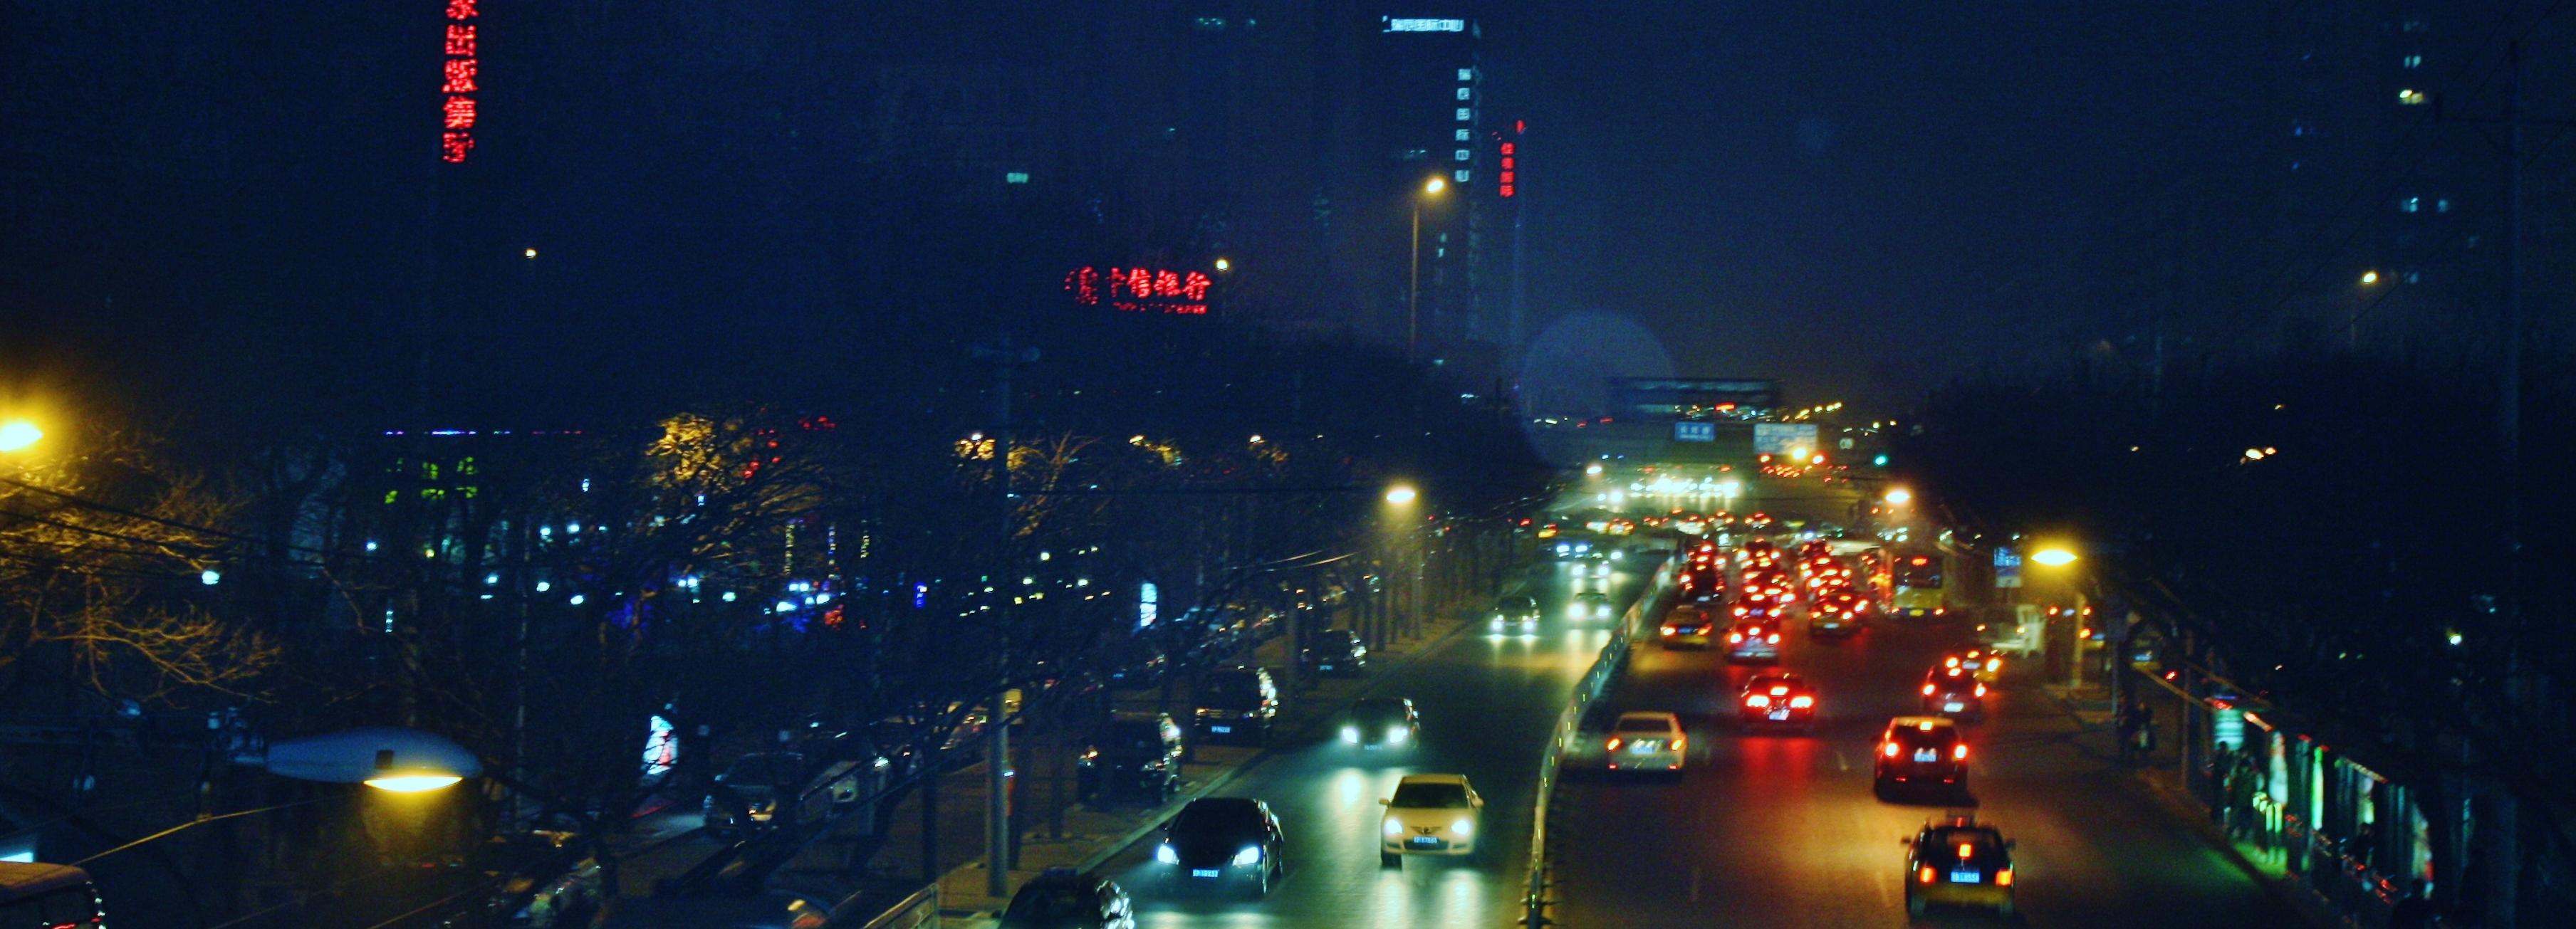 Pekingin valot